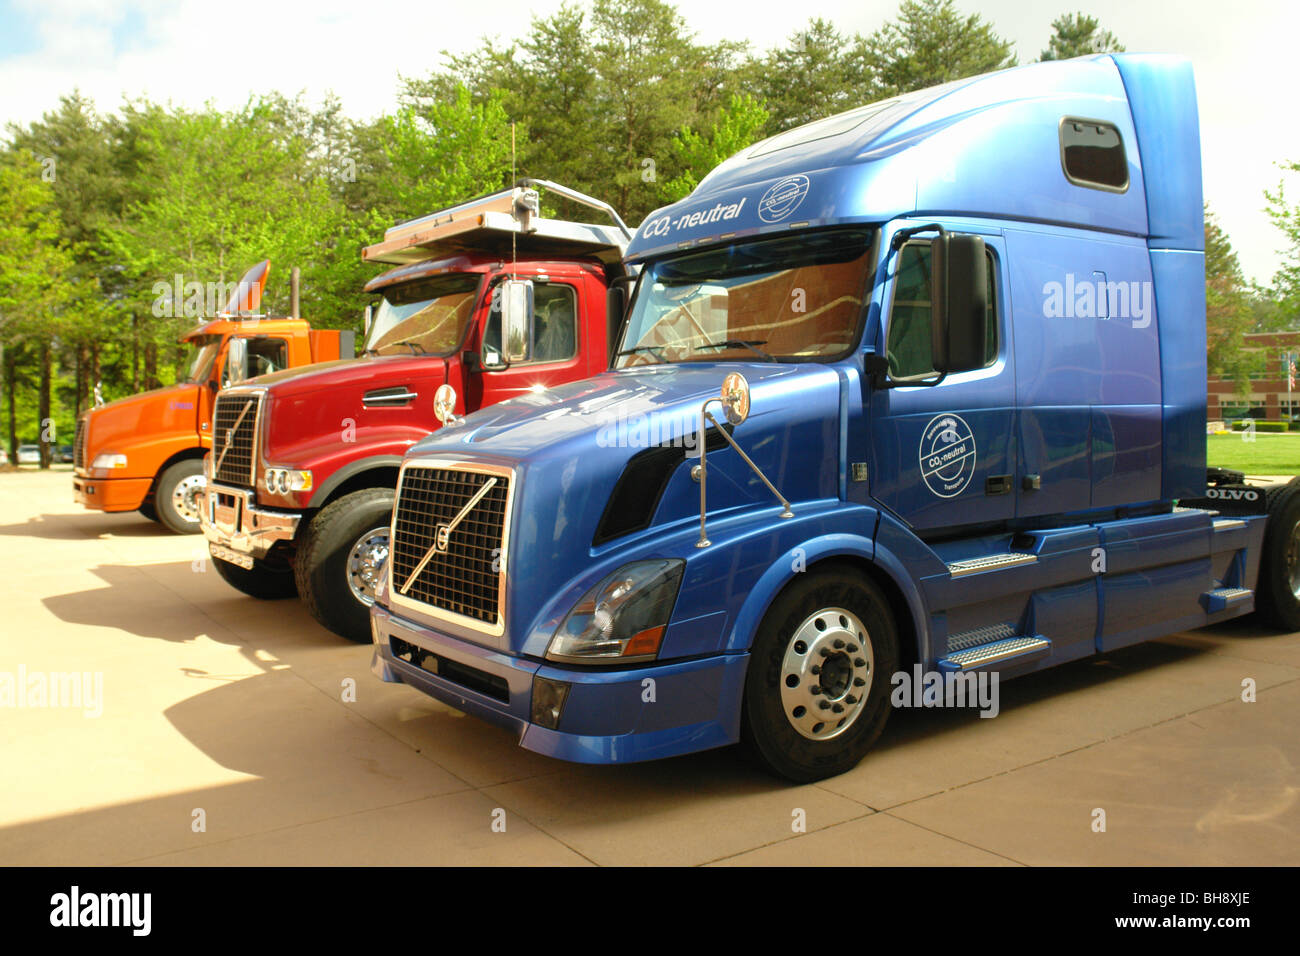 Volvo North America Ajd64220 Greensboro Nc North Carolina Volvo Trucks North